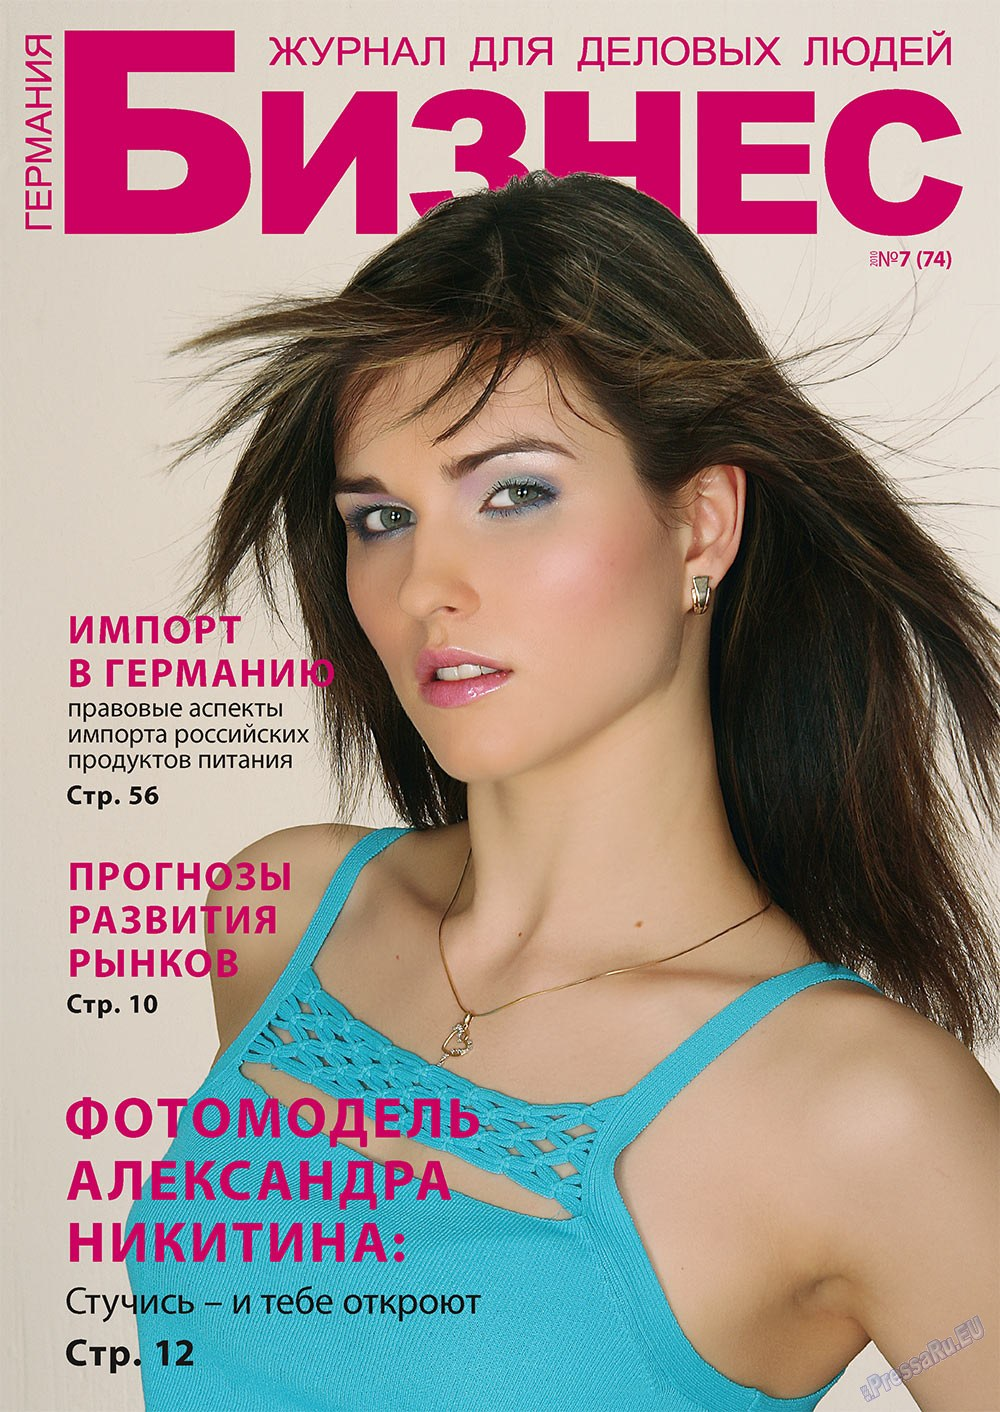 Бизнес (журнал). 2010 год, номер 7, стр. 1